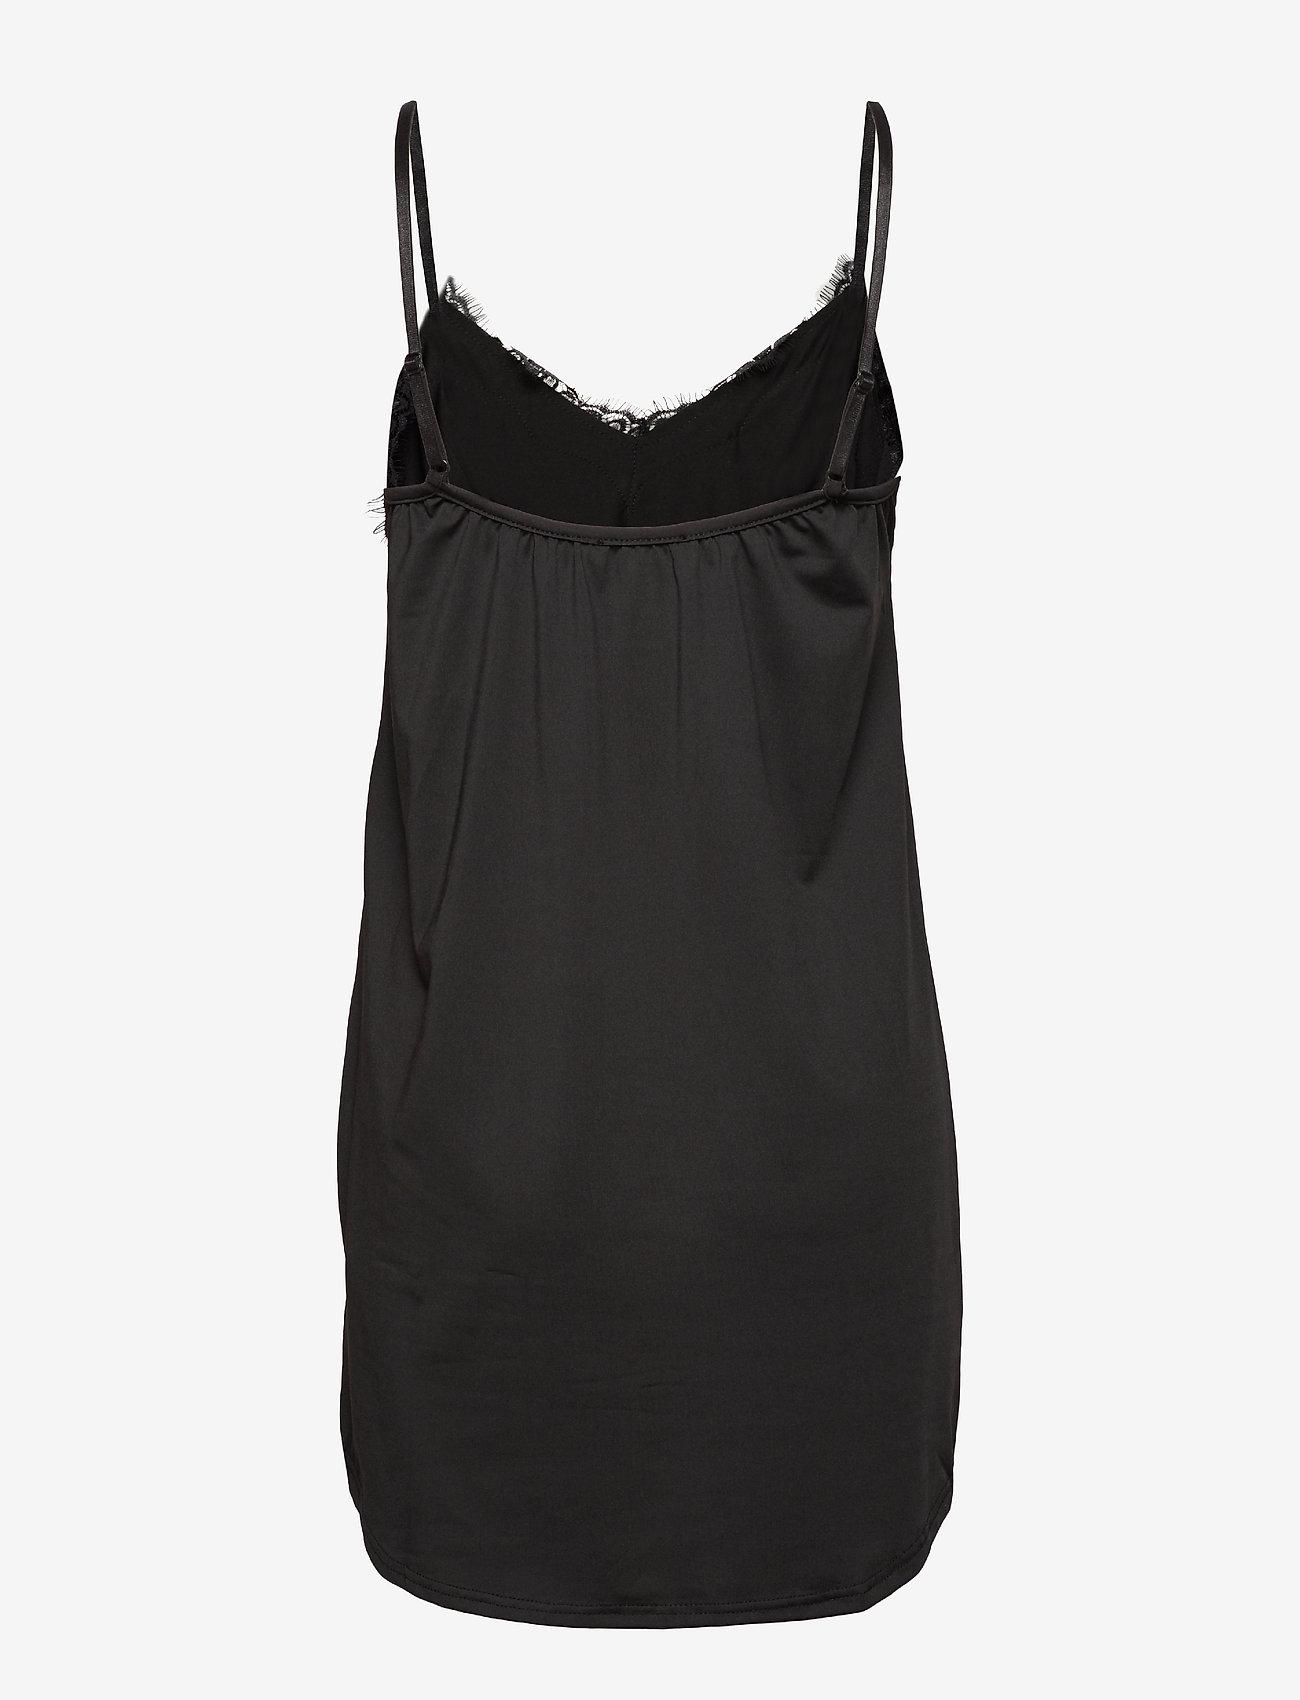 Coster Copenhagen - CC Heart lace slip dress (B5207) - body & sukienki - black - 1